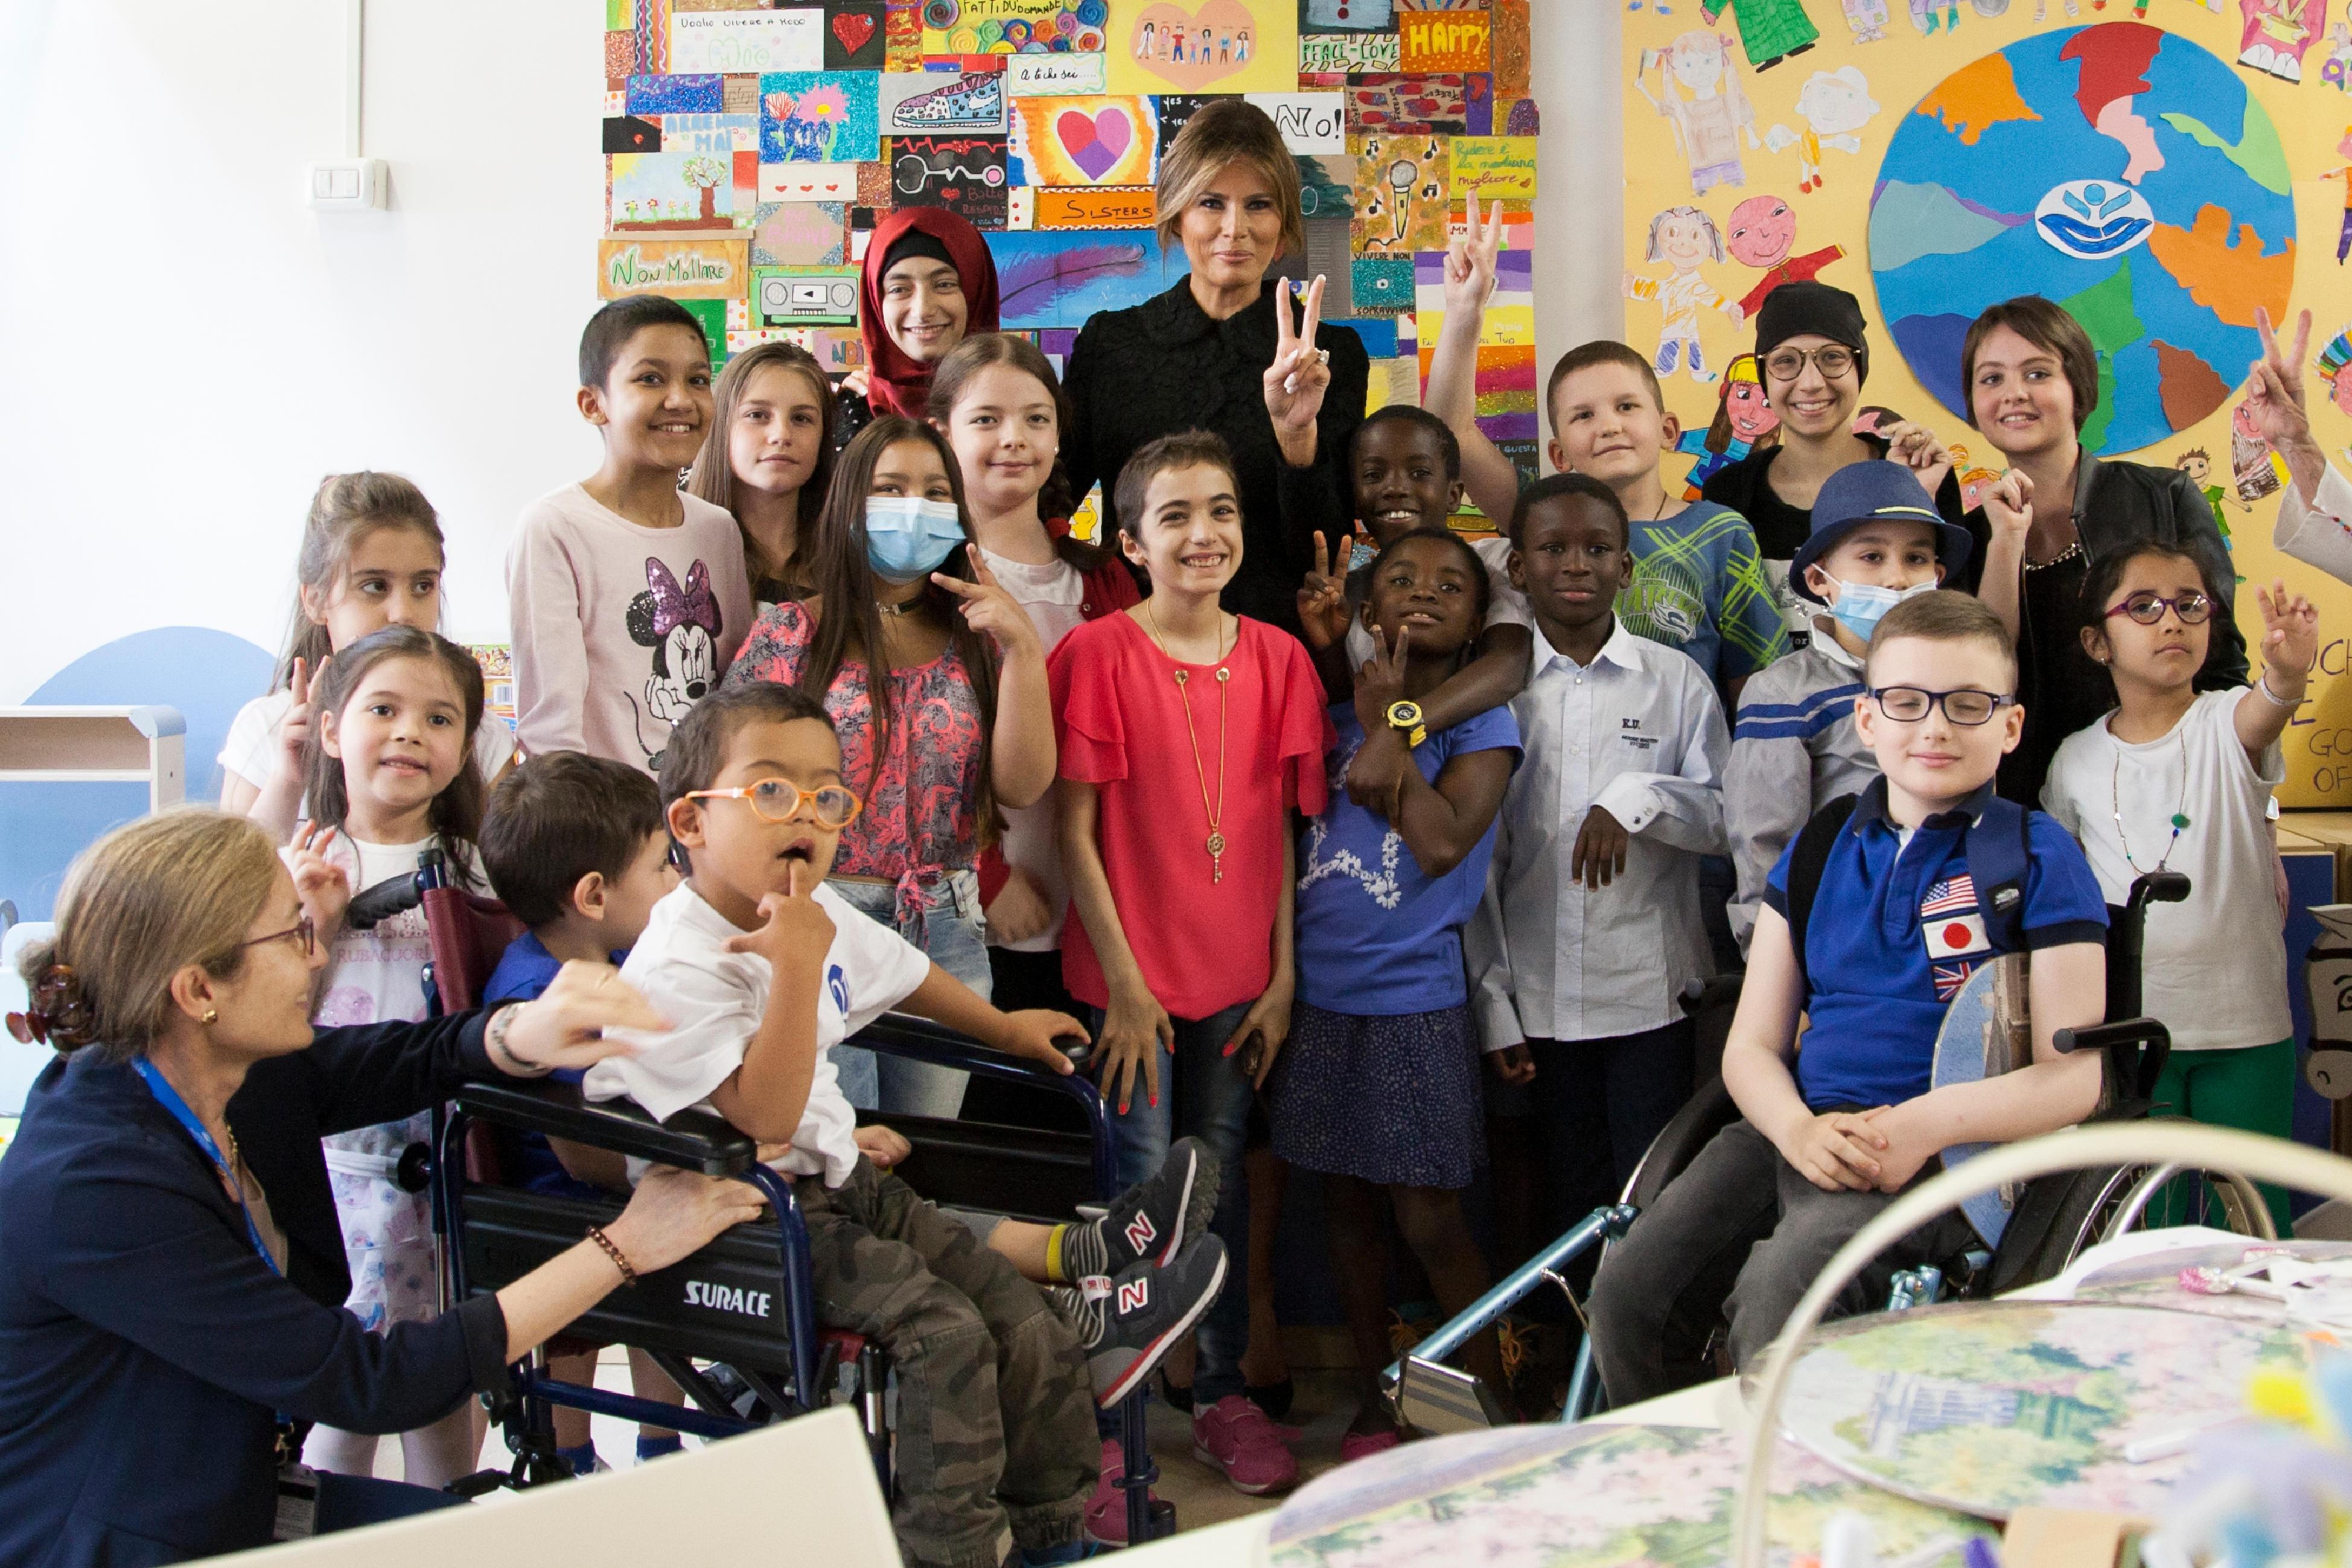 Visite de la First Lady Melania Trump à l'hôpital pédiatrique Bambino Gesù du Vatican © L'Osservatore Romano